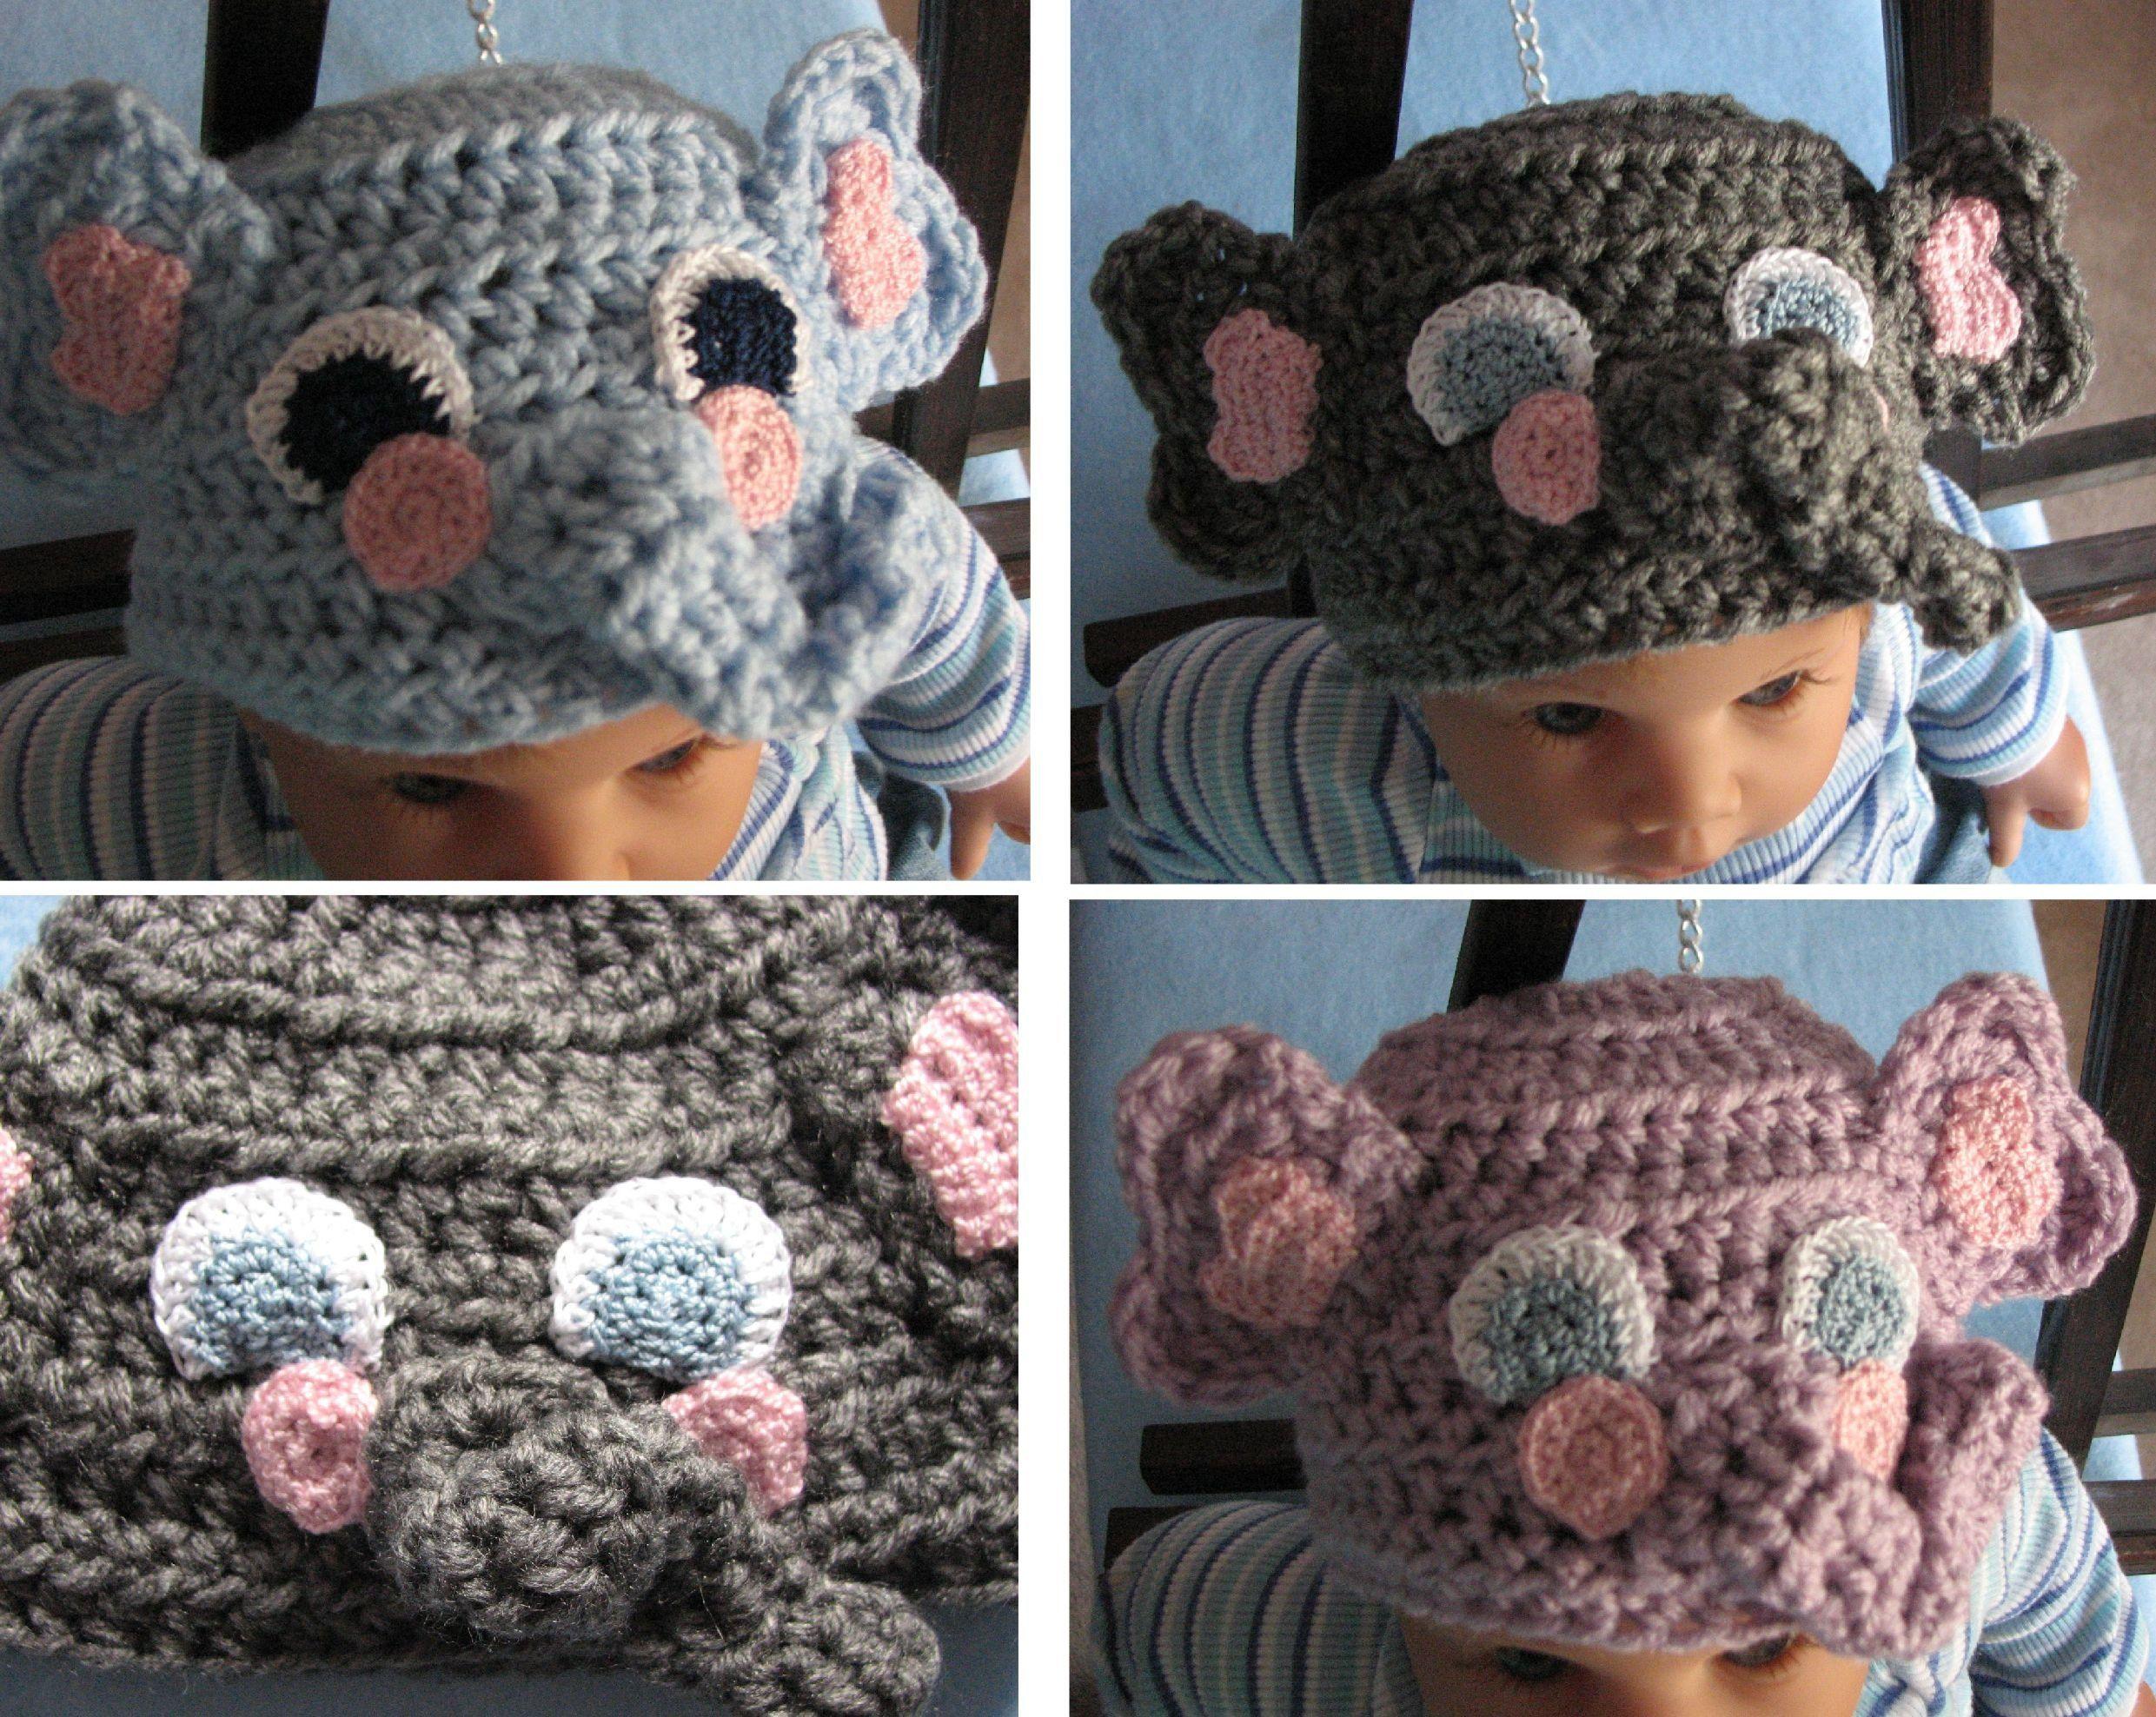 e3cd6bc91 Elephant - Infant Hat Crochet Pattern With Tutorials - Digital ...